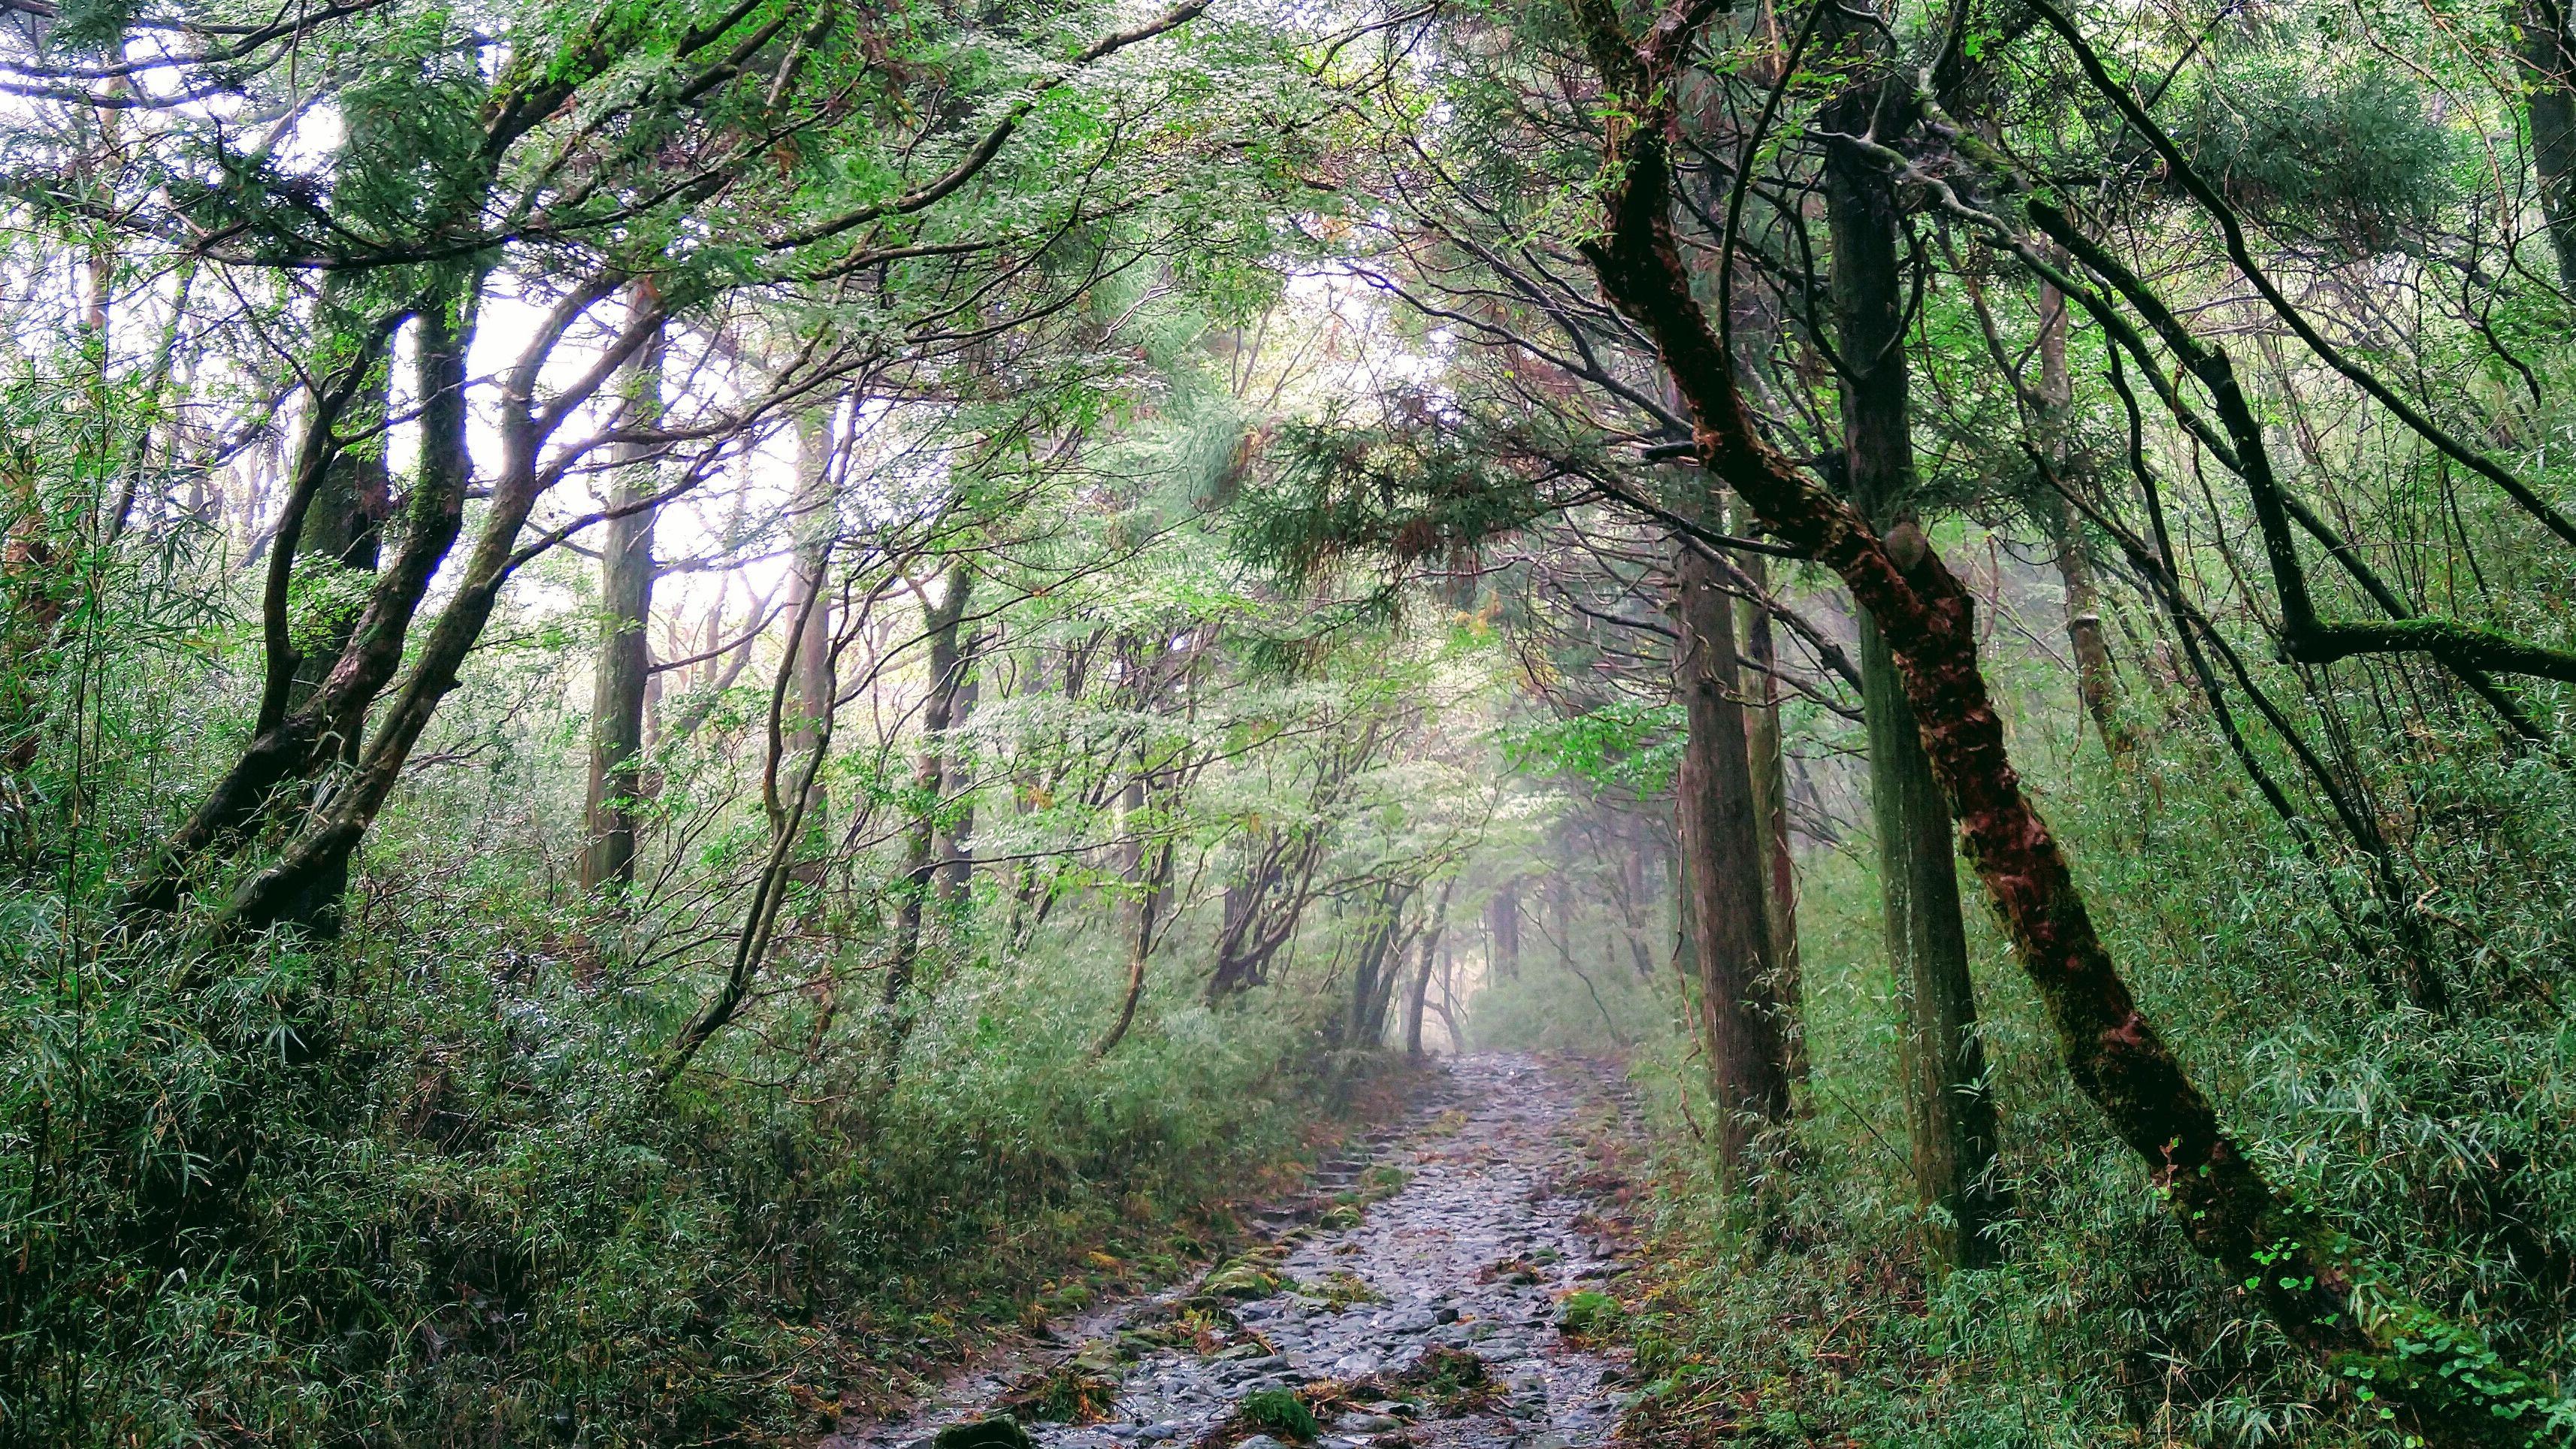 Forest bathing / Shinrin-Yoku: Nature is medicine